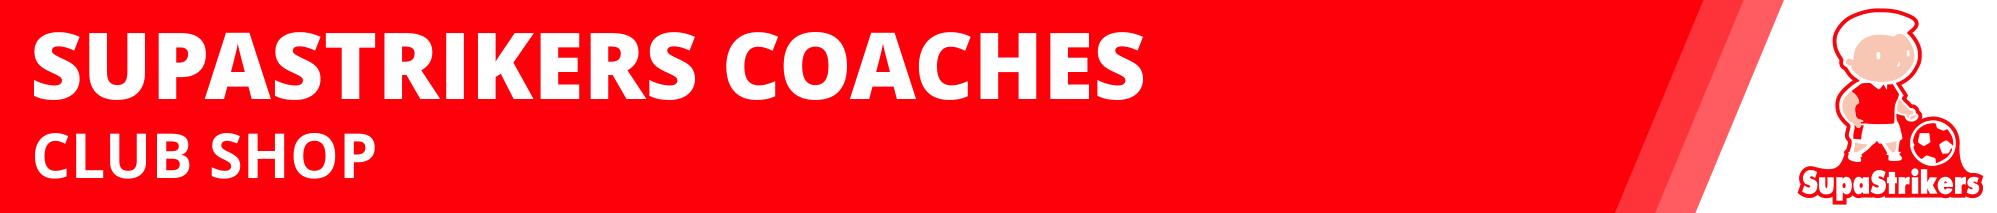 supastrikers-coaches-club-shop-banner.png